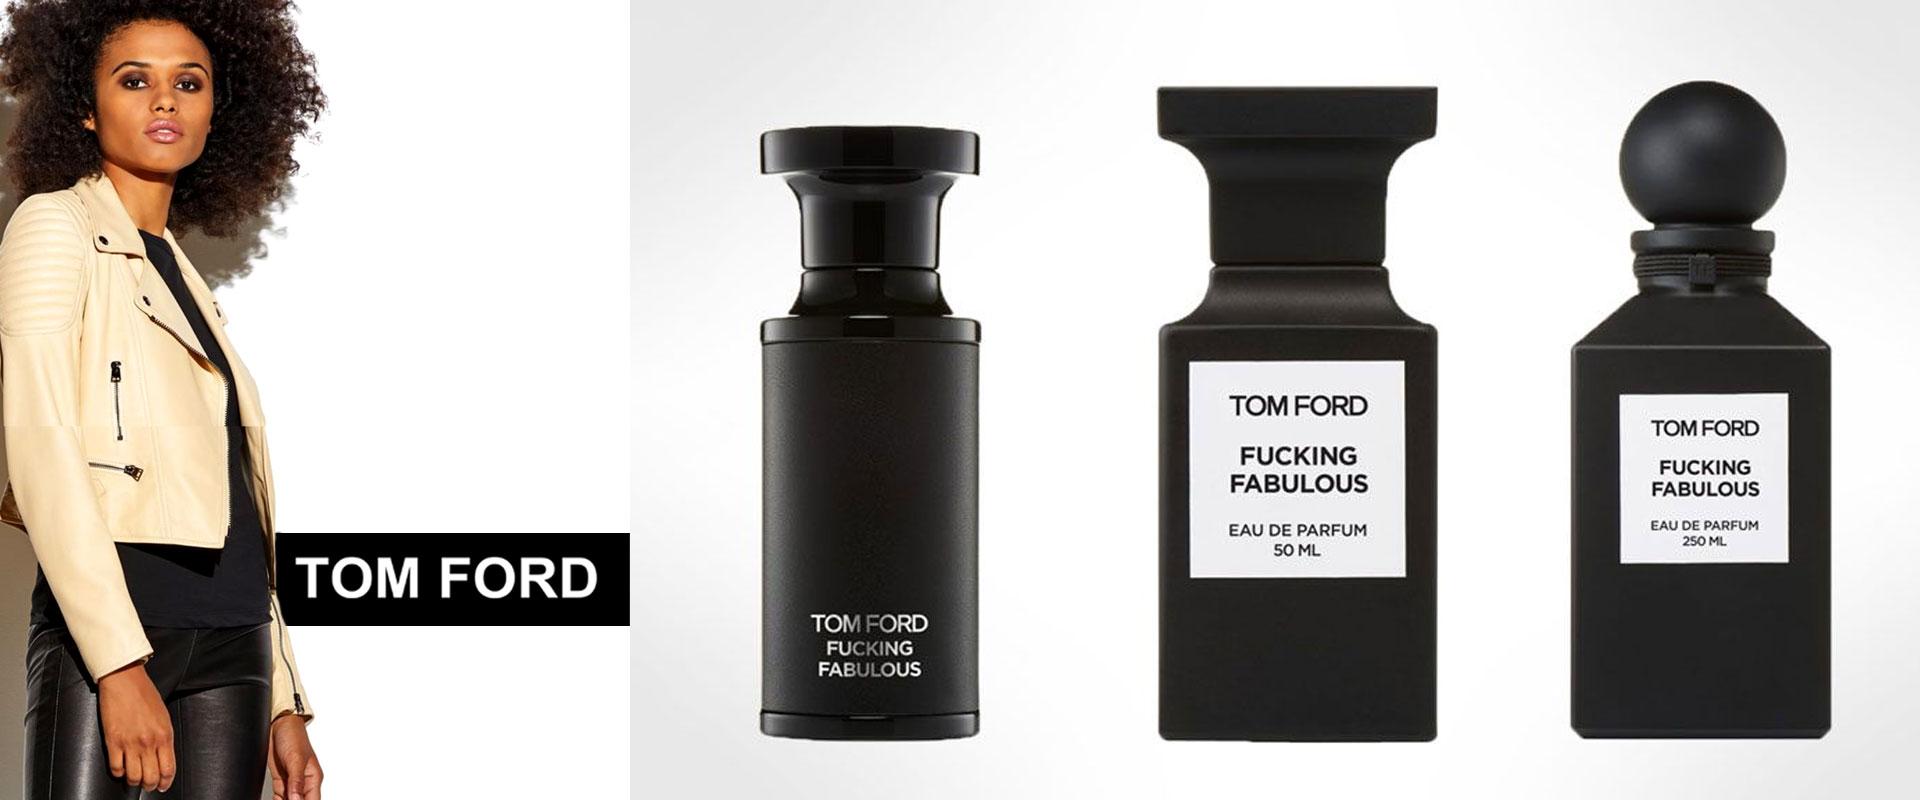 TomFord 1 1 - تام فورد Tom Ford